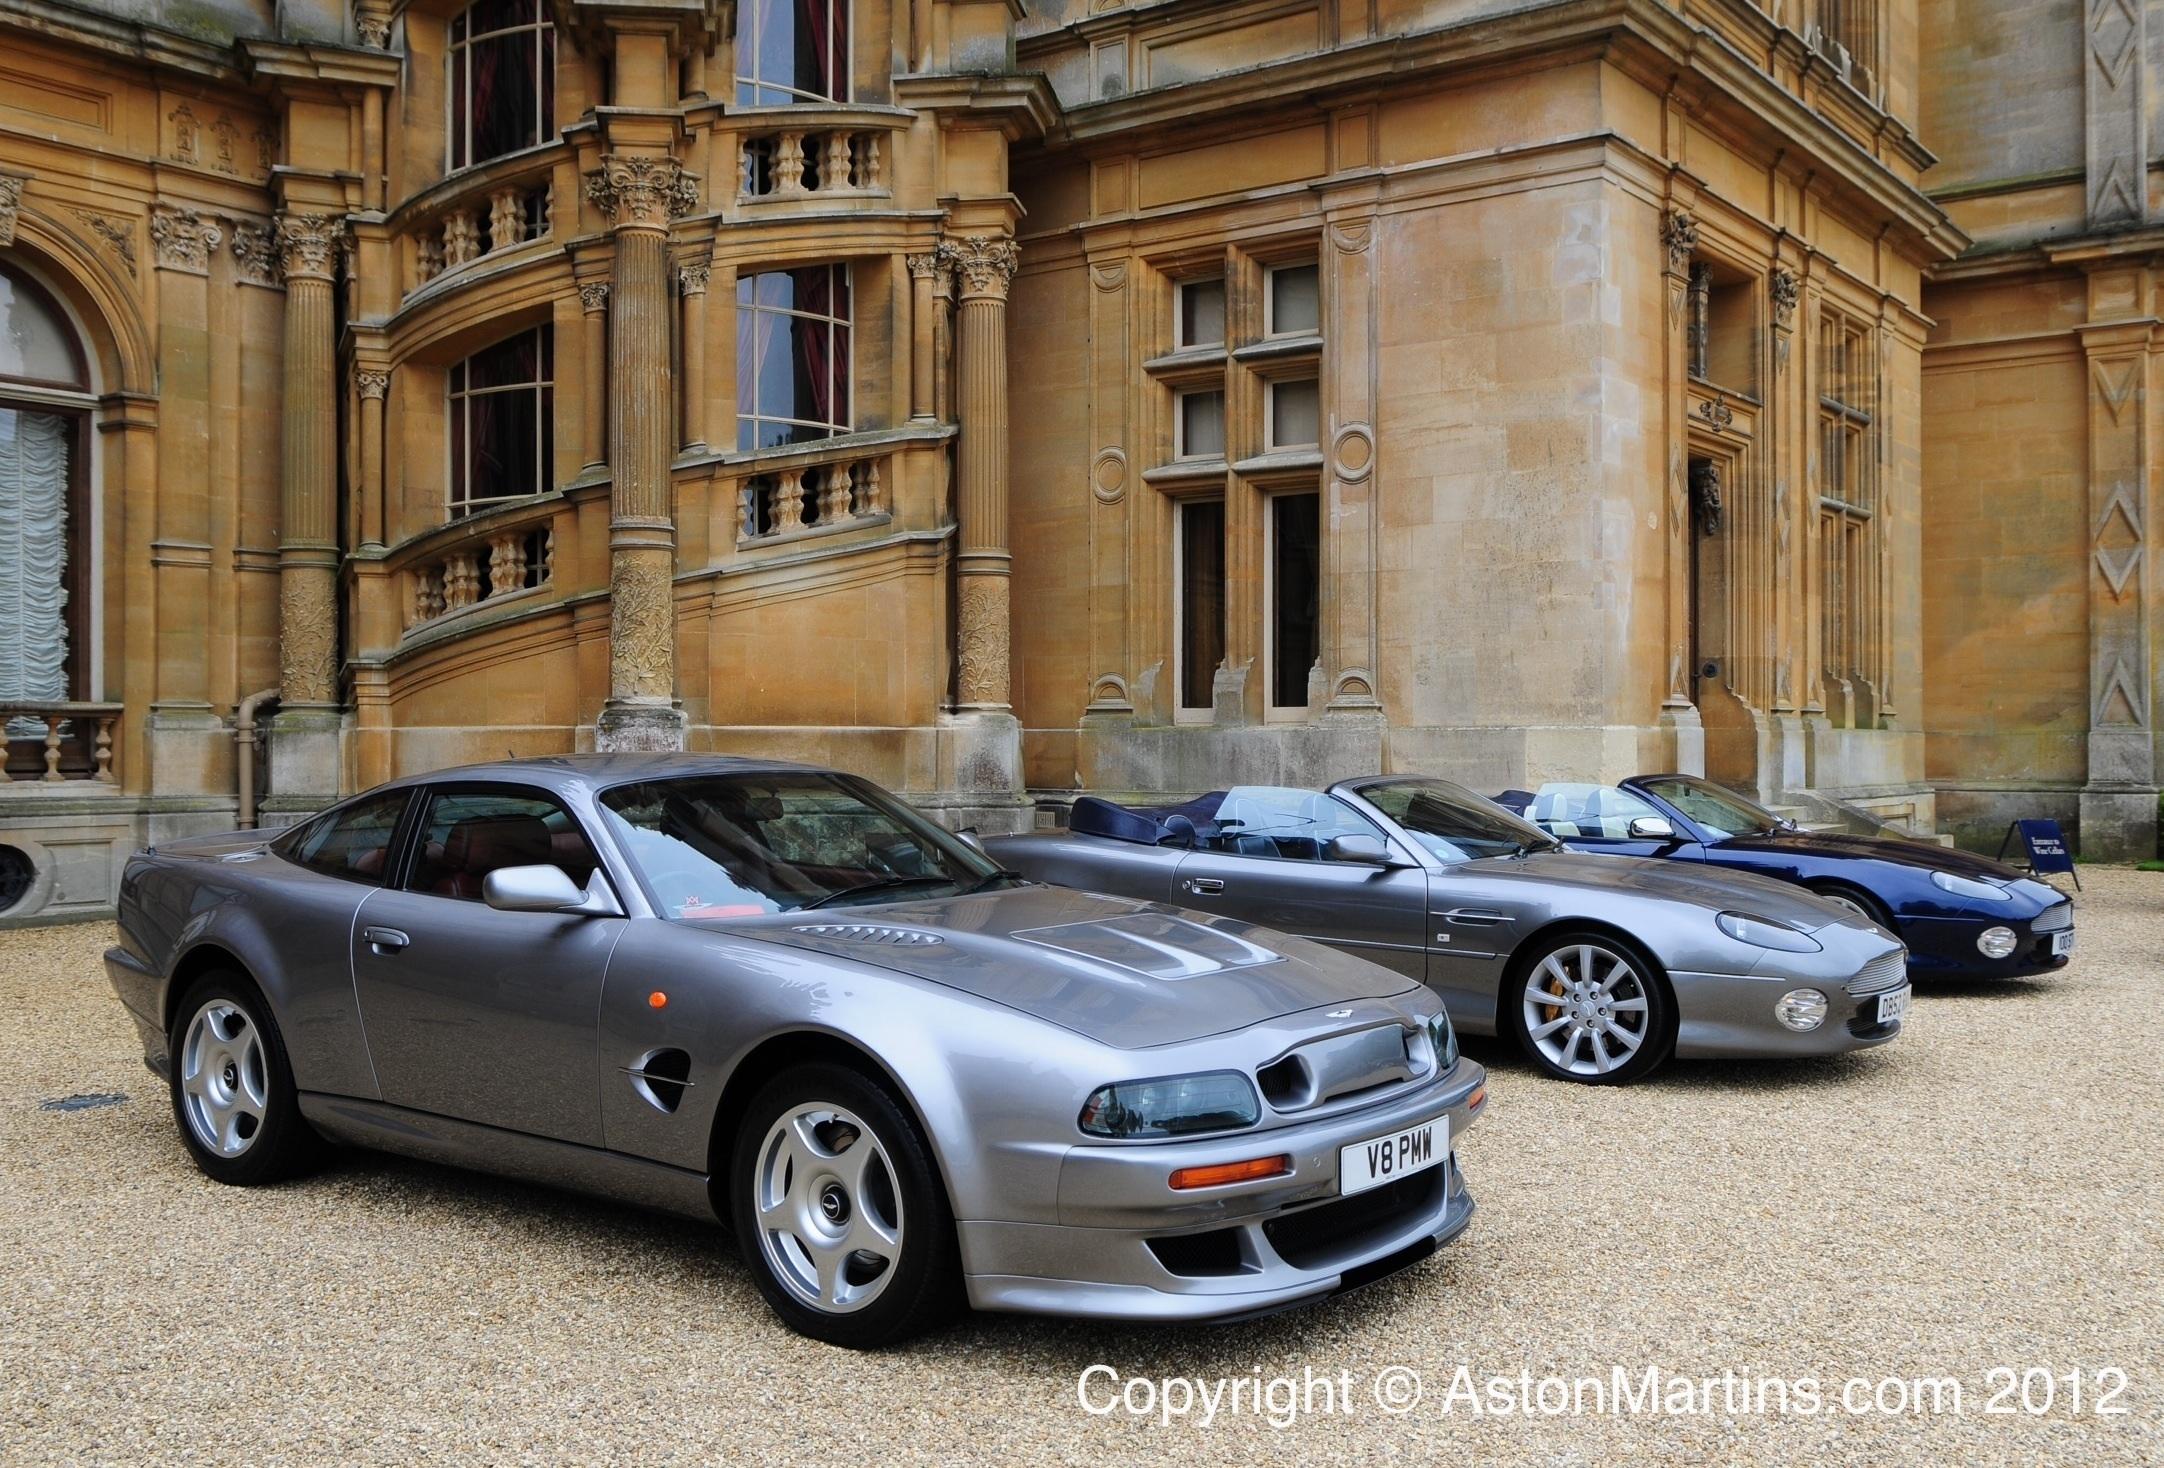 V8 Vantage Le Mans Aston Martins Com